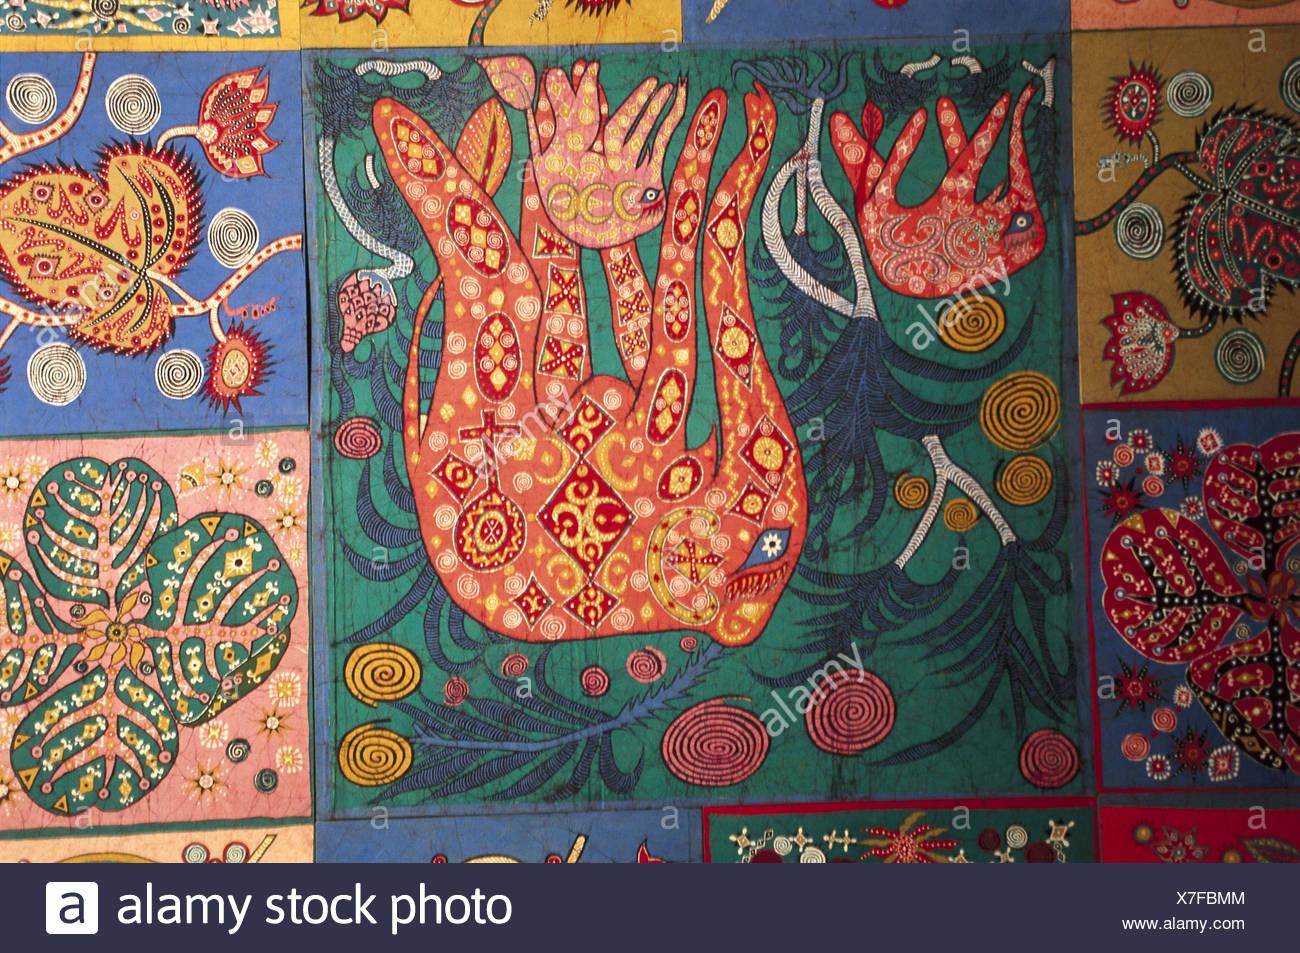 Sri Lanka Handicraft Substance Cloth Batik Work South Asia